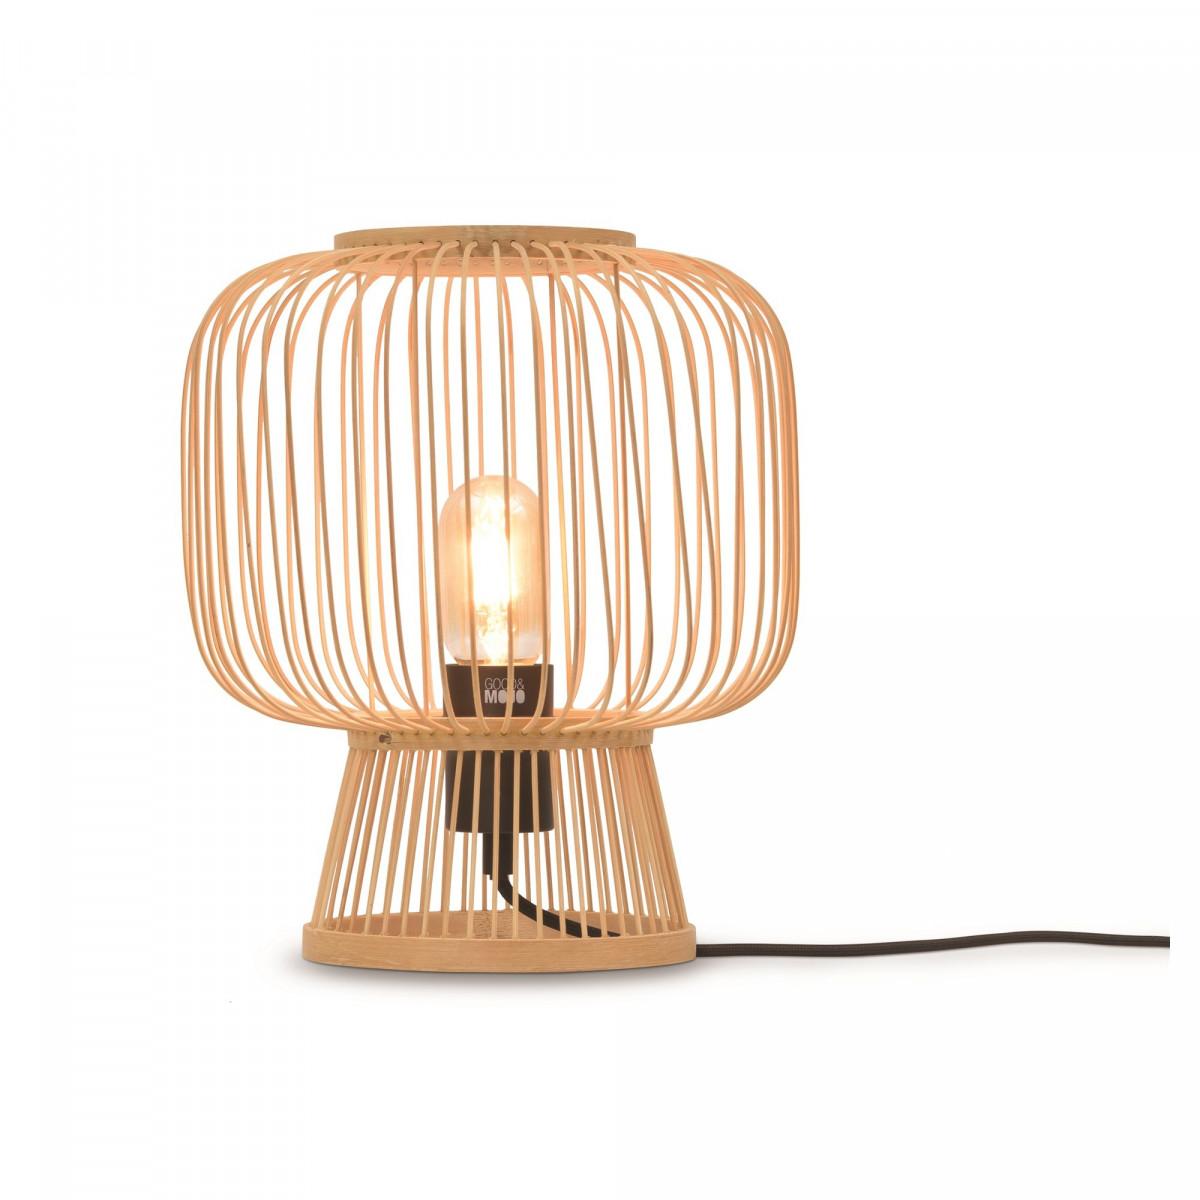 Lampe de table Cango en bambou et fer Naturelw